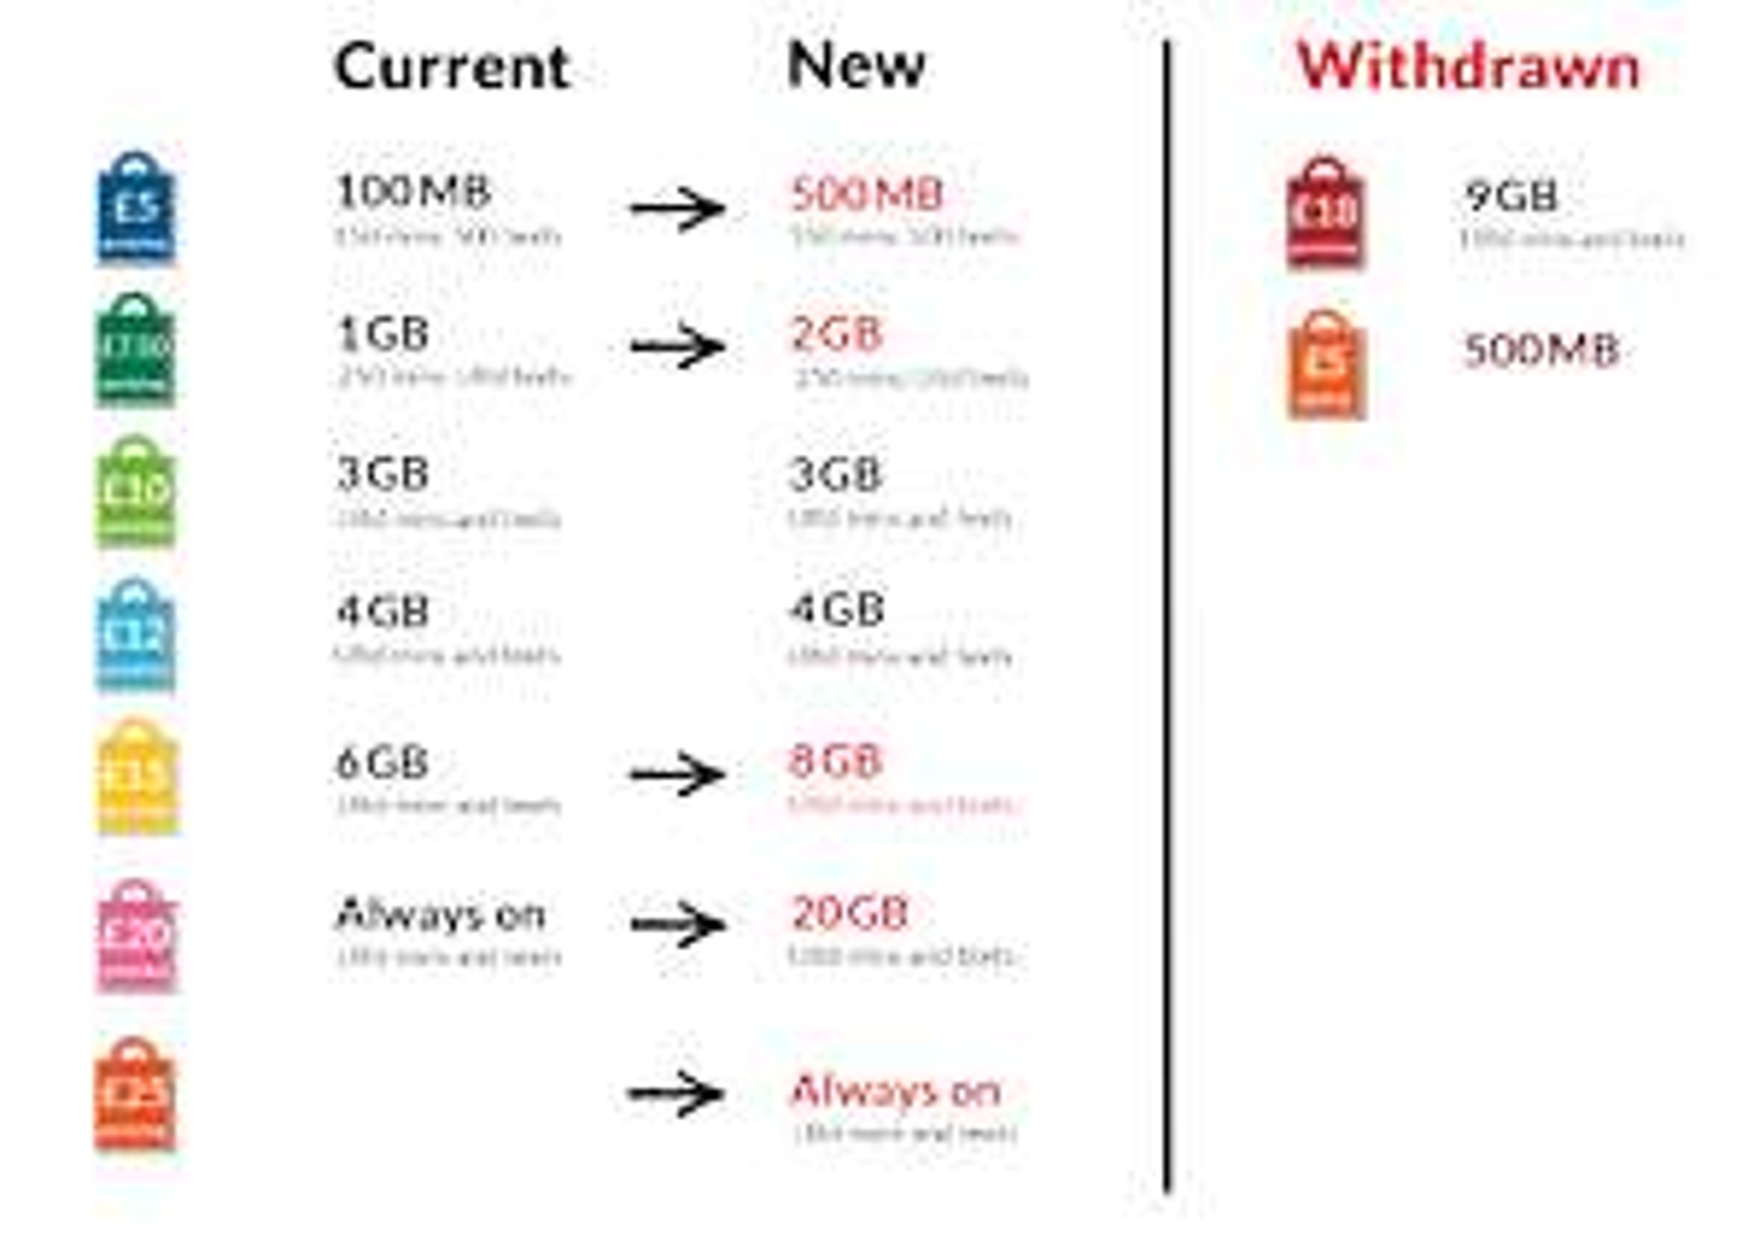 Giffgaff: Revised goody bags (500MB £5p/m, 2GB £7.50p/m, 8GB £15p/m)